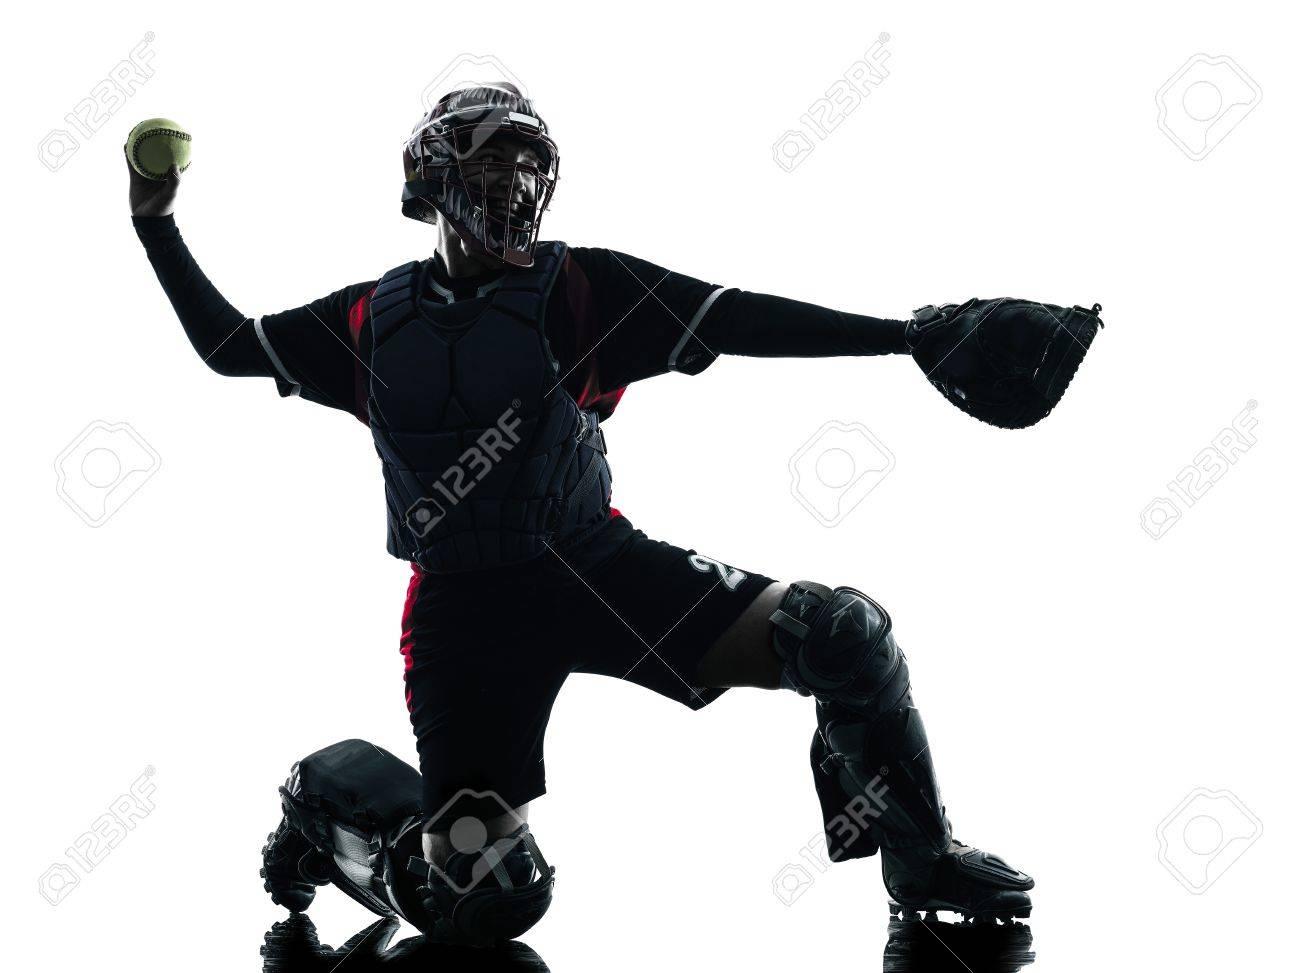 Softball Catcher Silhouette